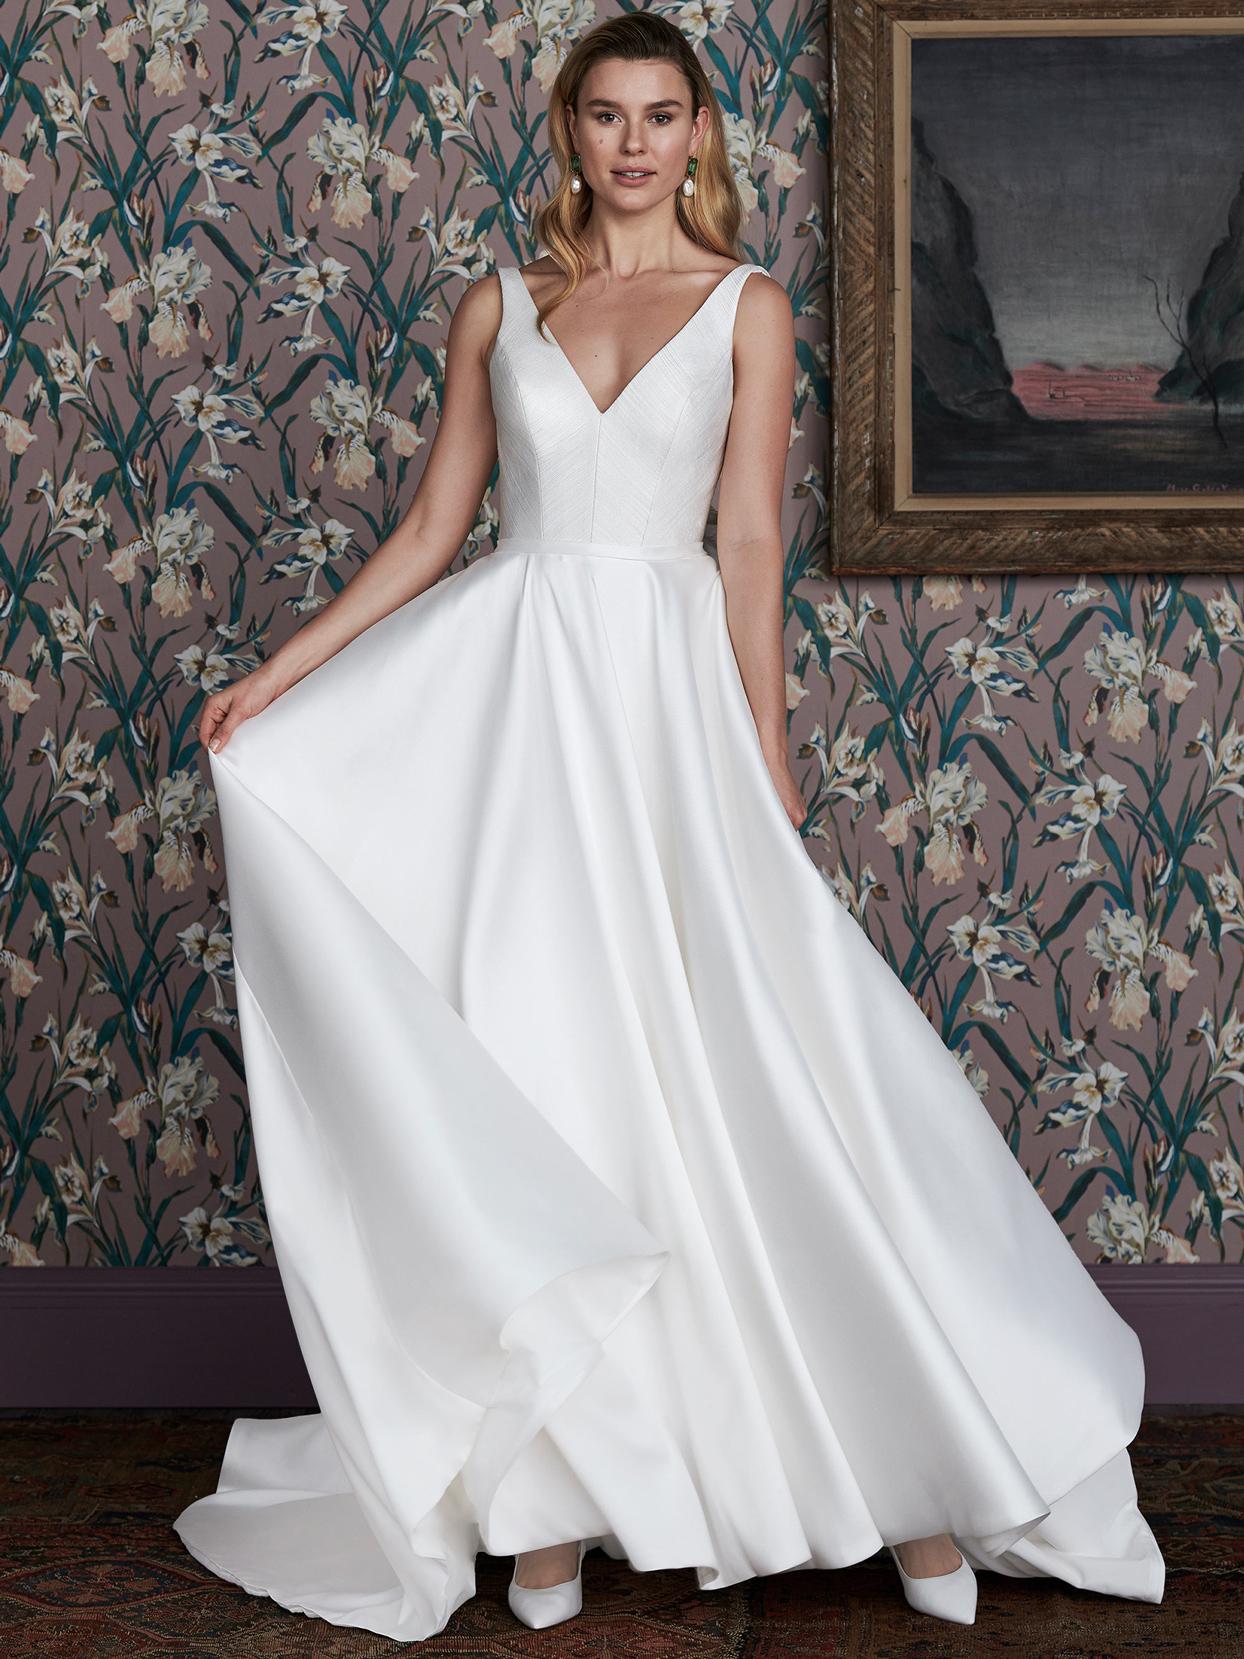 justin alexander v-neck a-line sleeveless wedding dress spring 2021